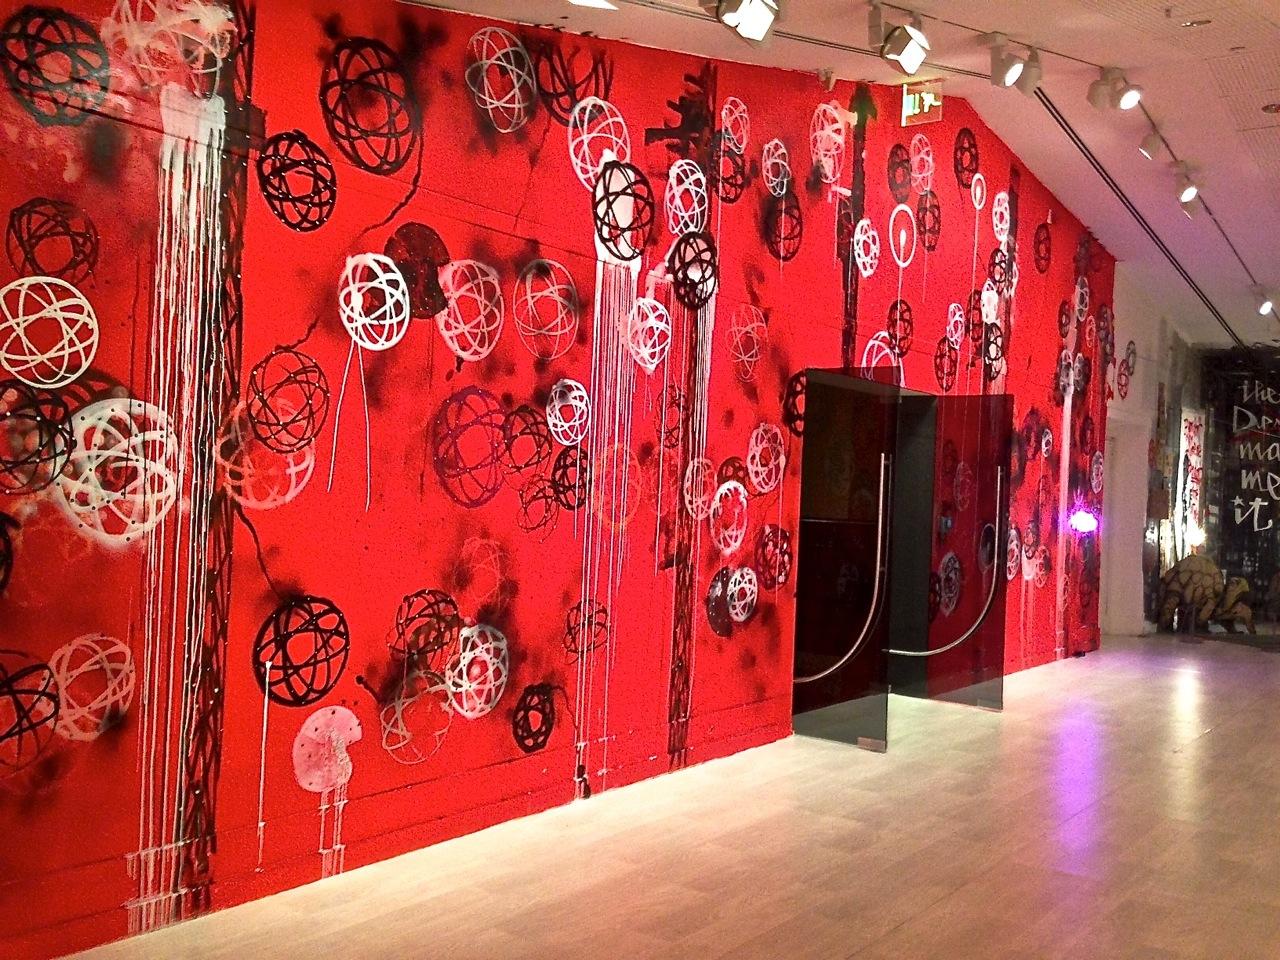 Grafiti wall red - Openings Language Of The Wall Graffiti Street Art Pera Museum Arrested Motion